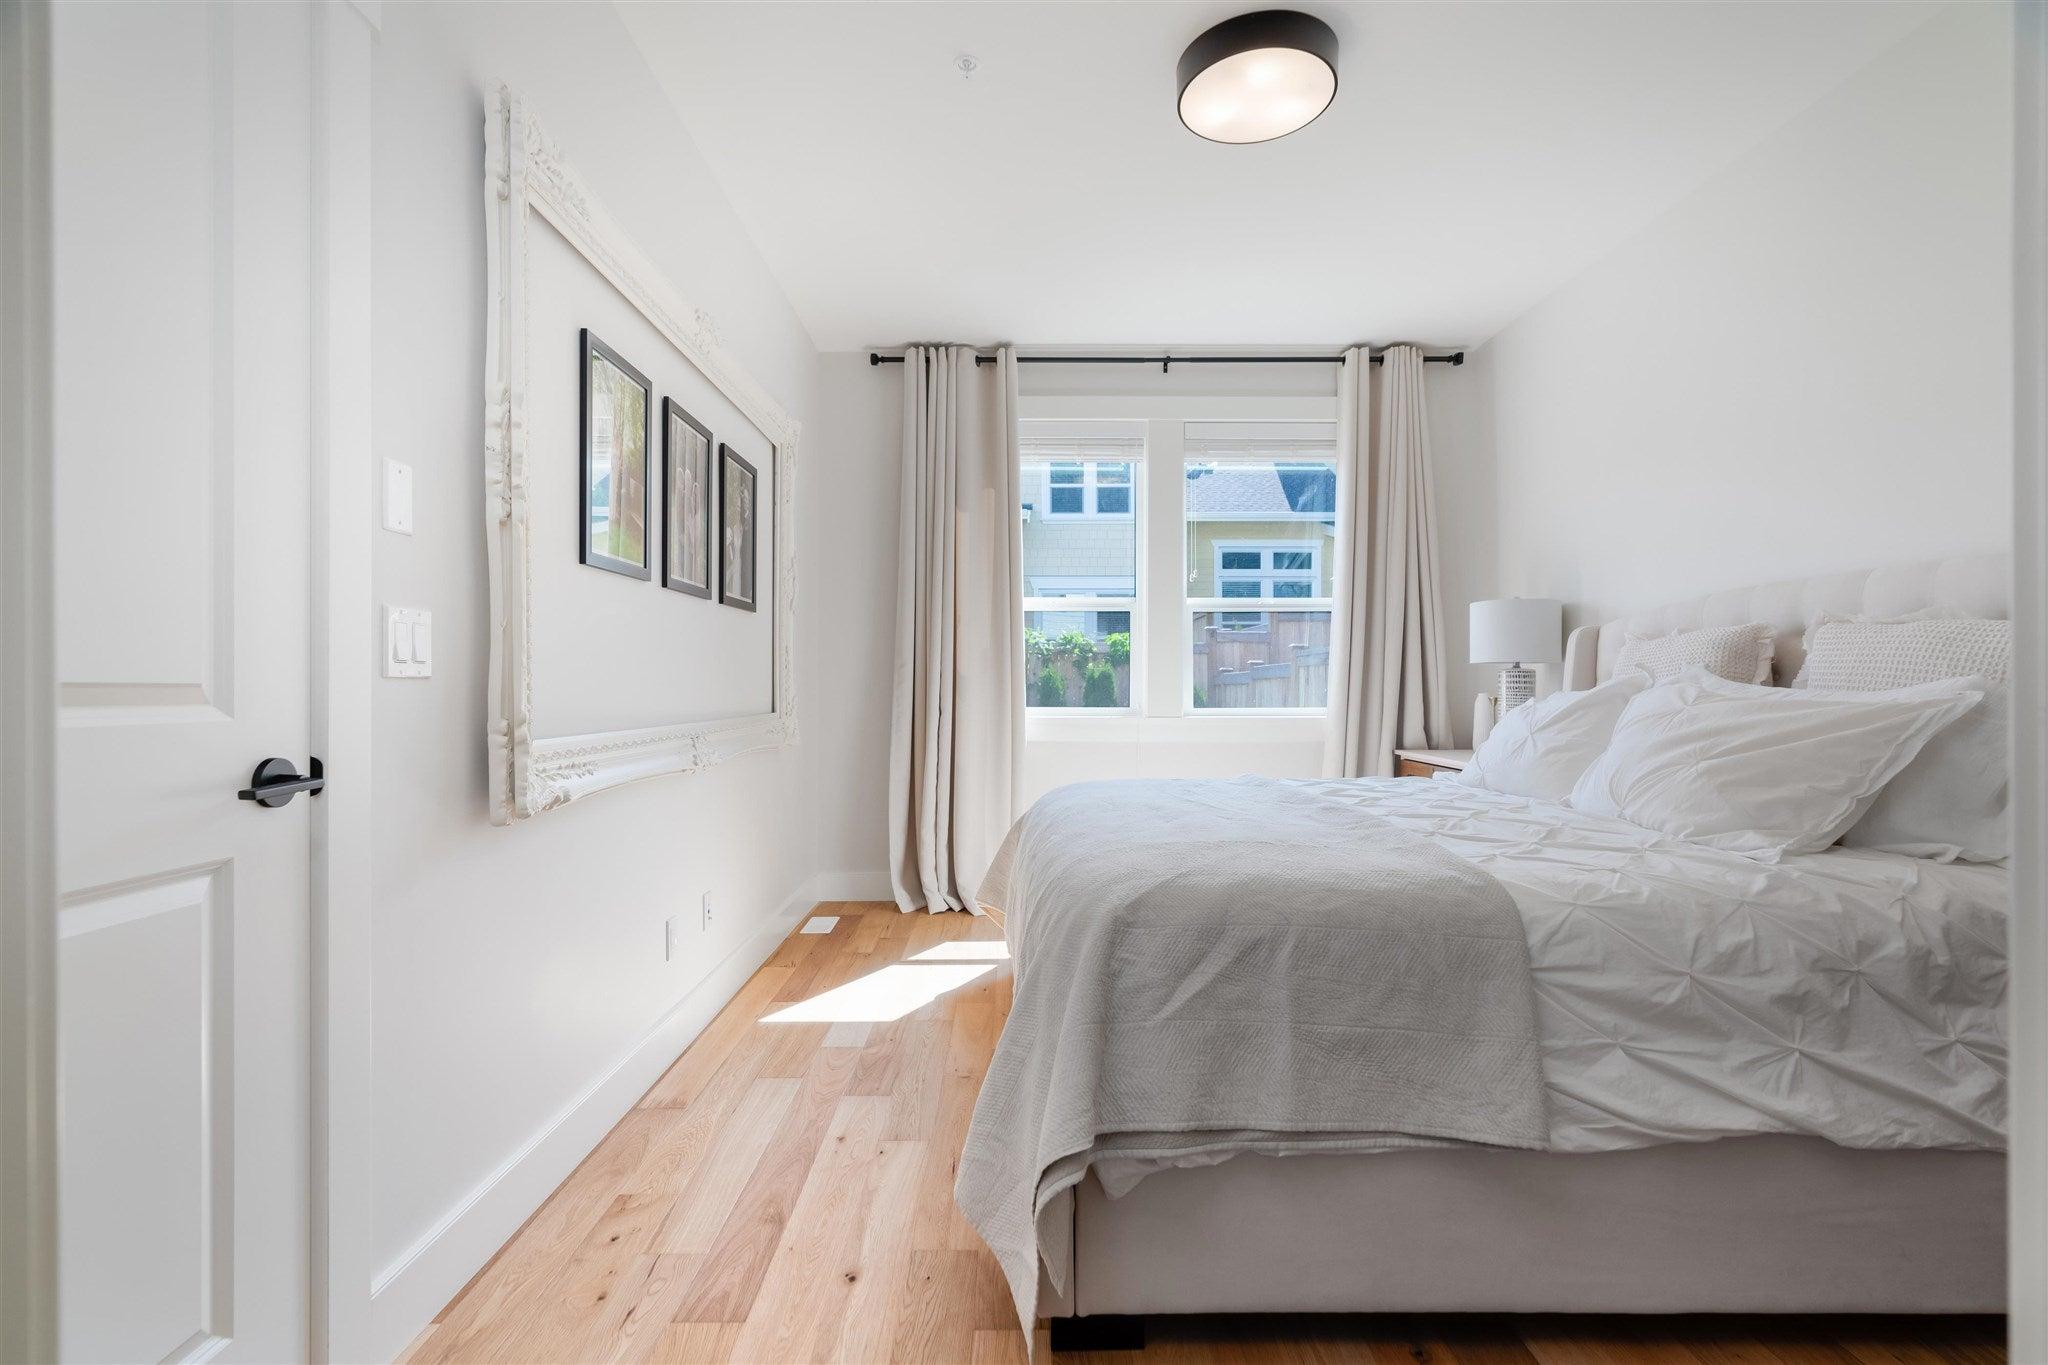 40 21858 47B AVENUE - Murrayville Townhouse for sale, 4 Bedrooms (R2603956) - #15